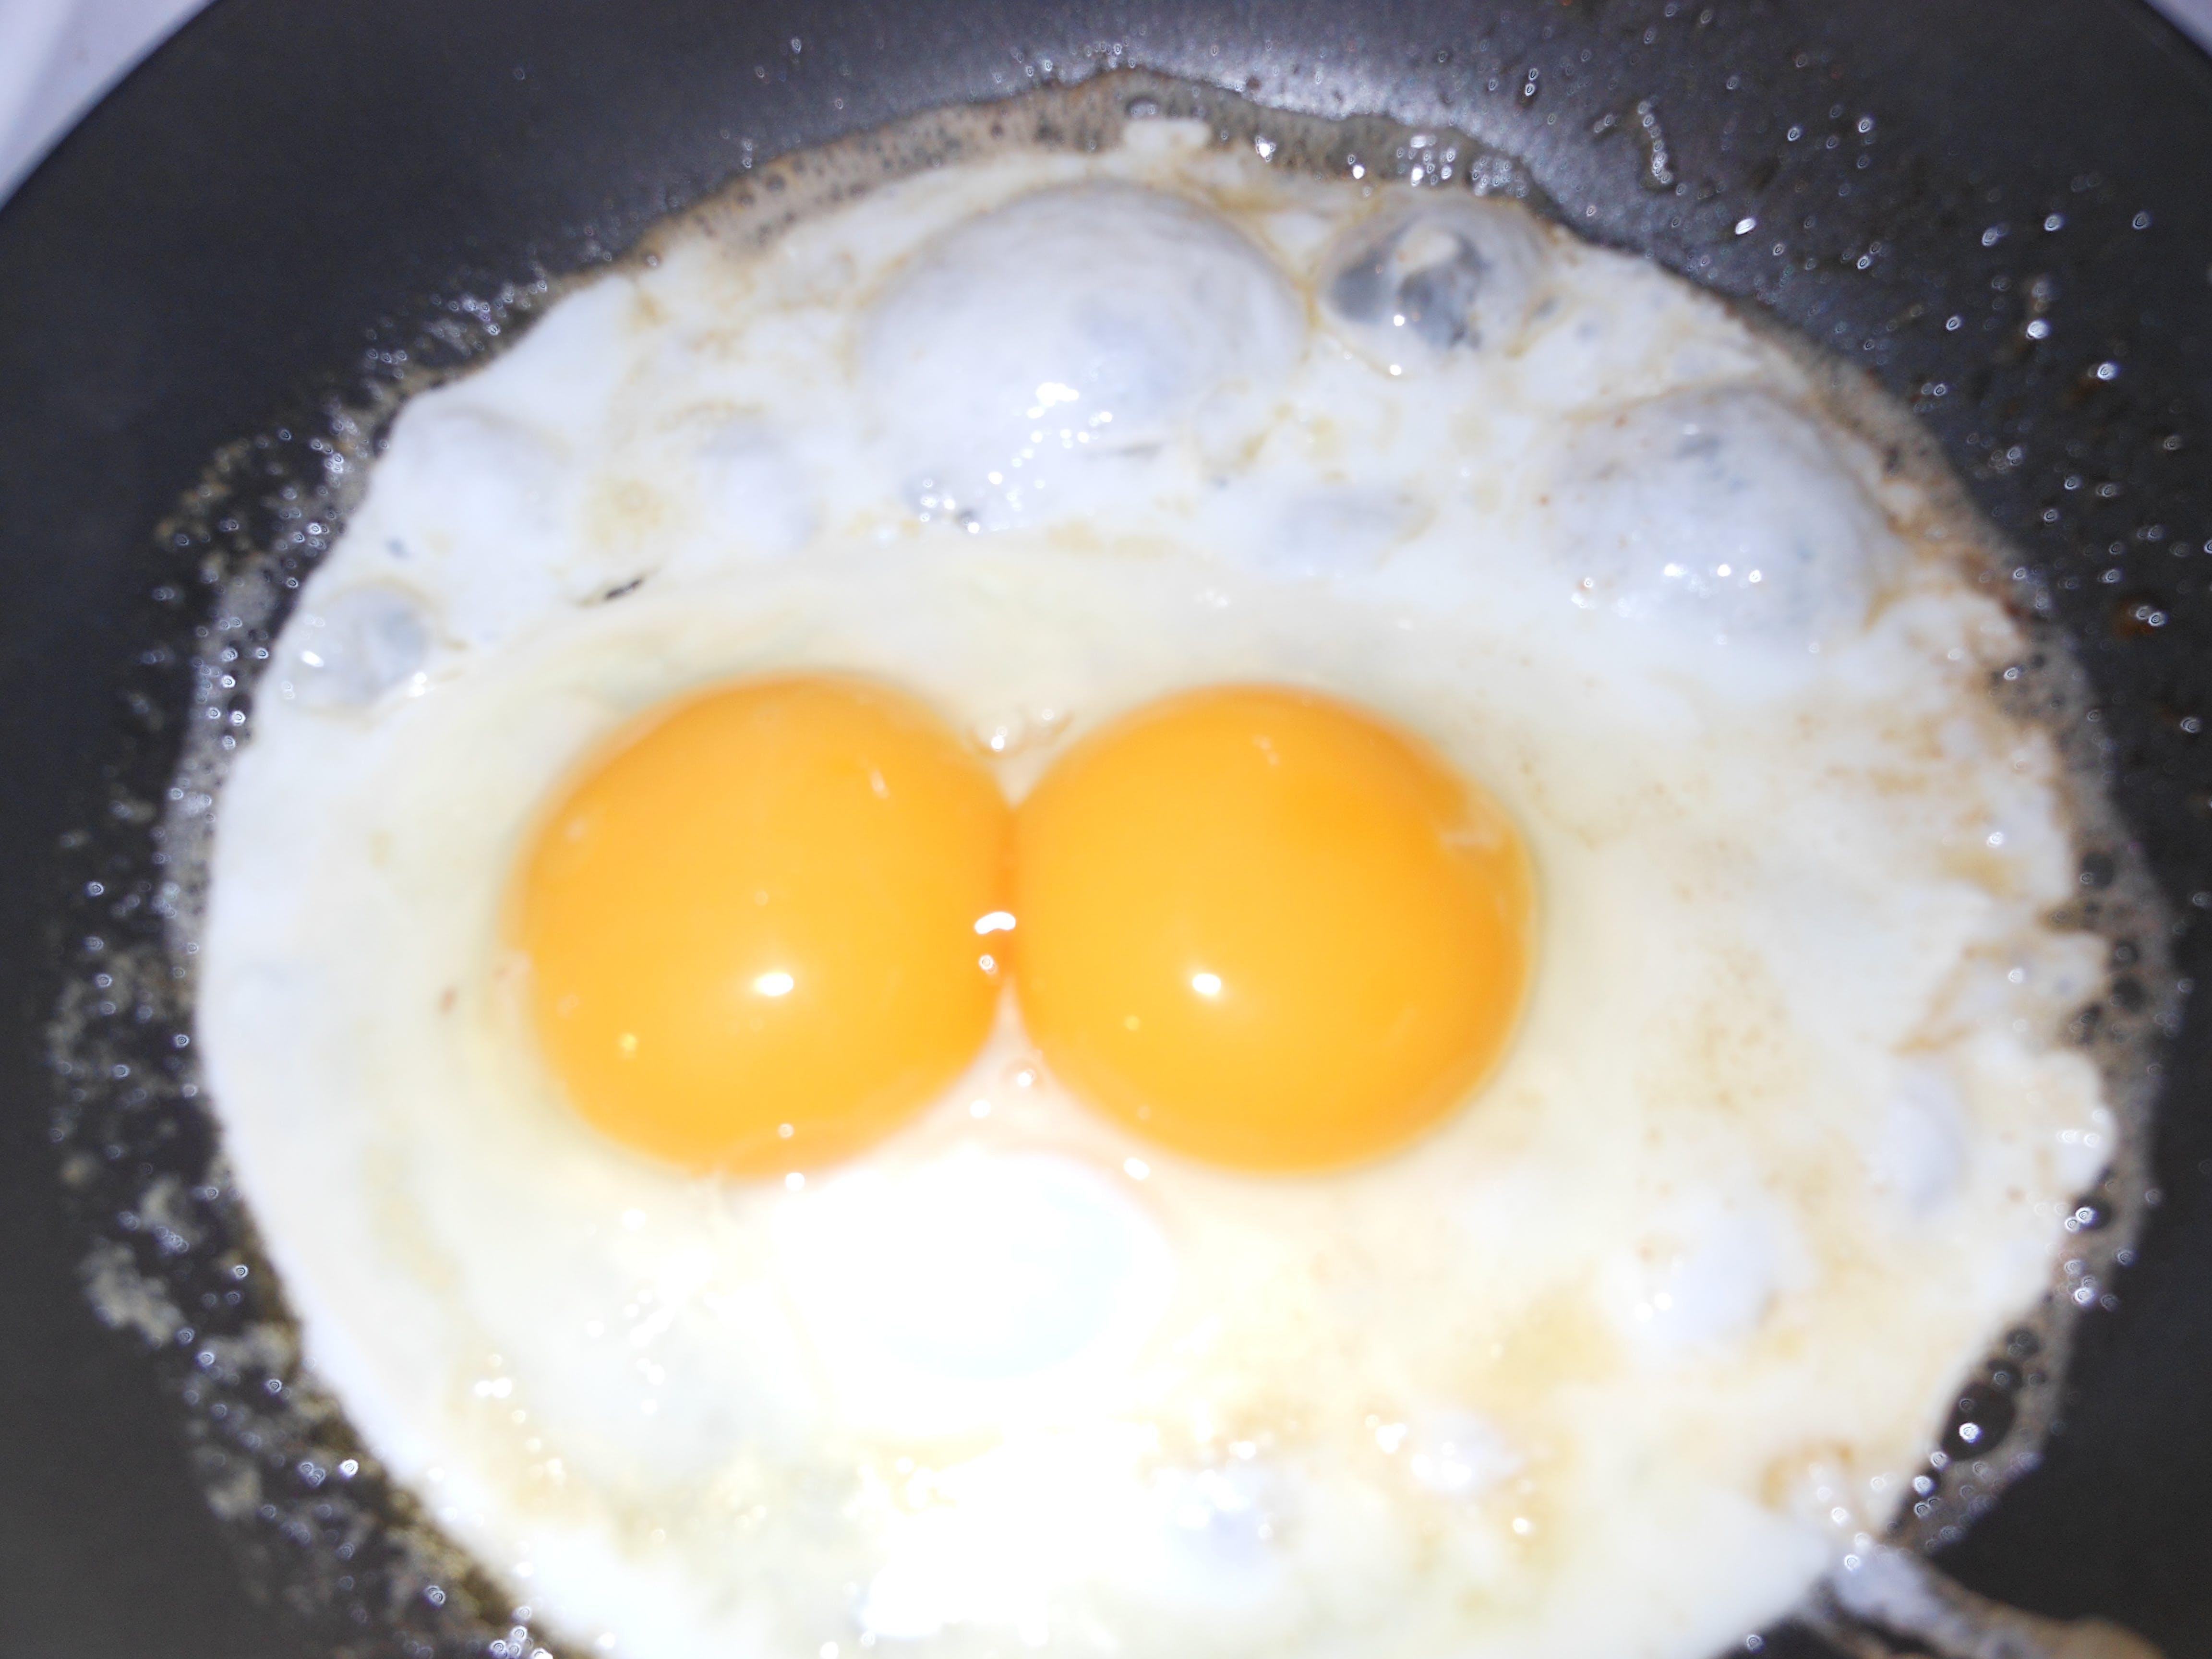 Free stock photo of Double-yolk egg, egg, Sunny side up egg